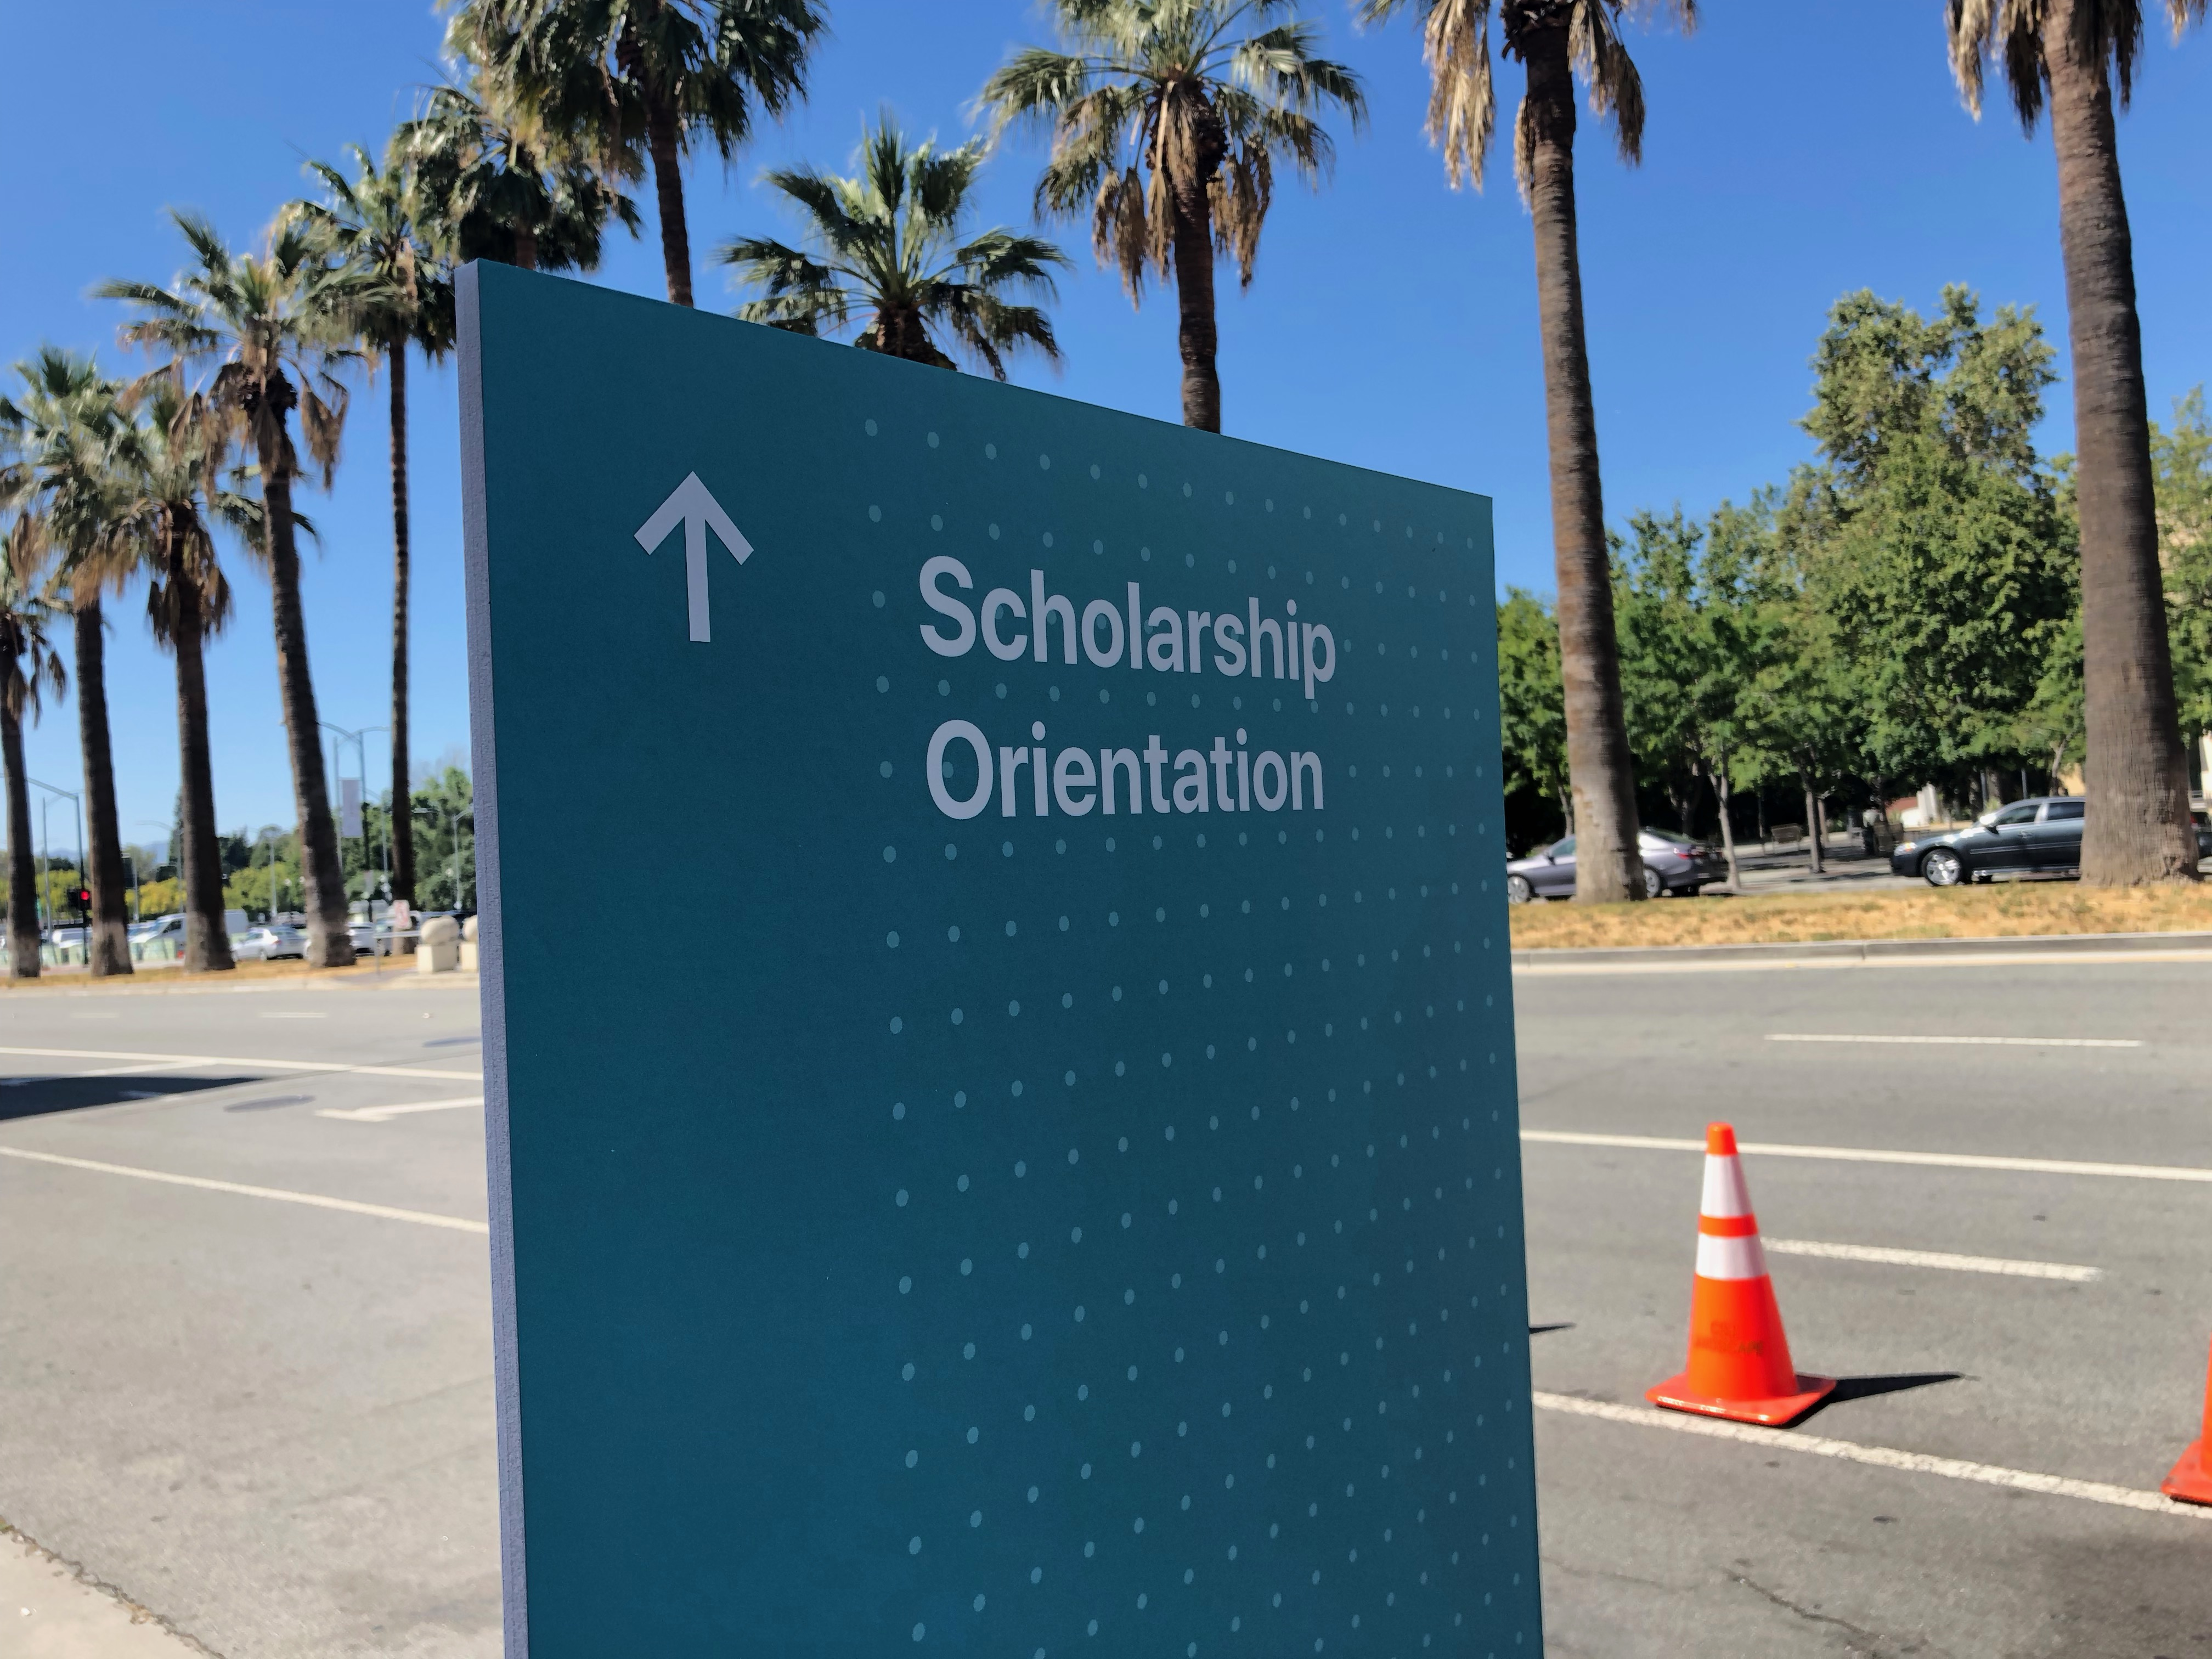 Scholarship Orientation